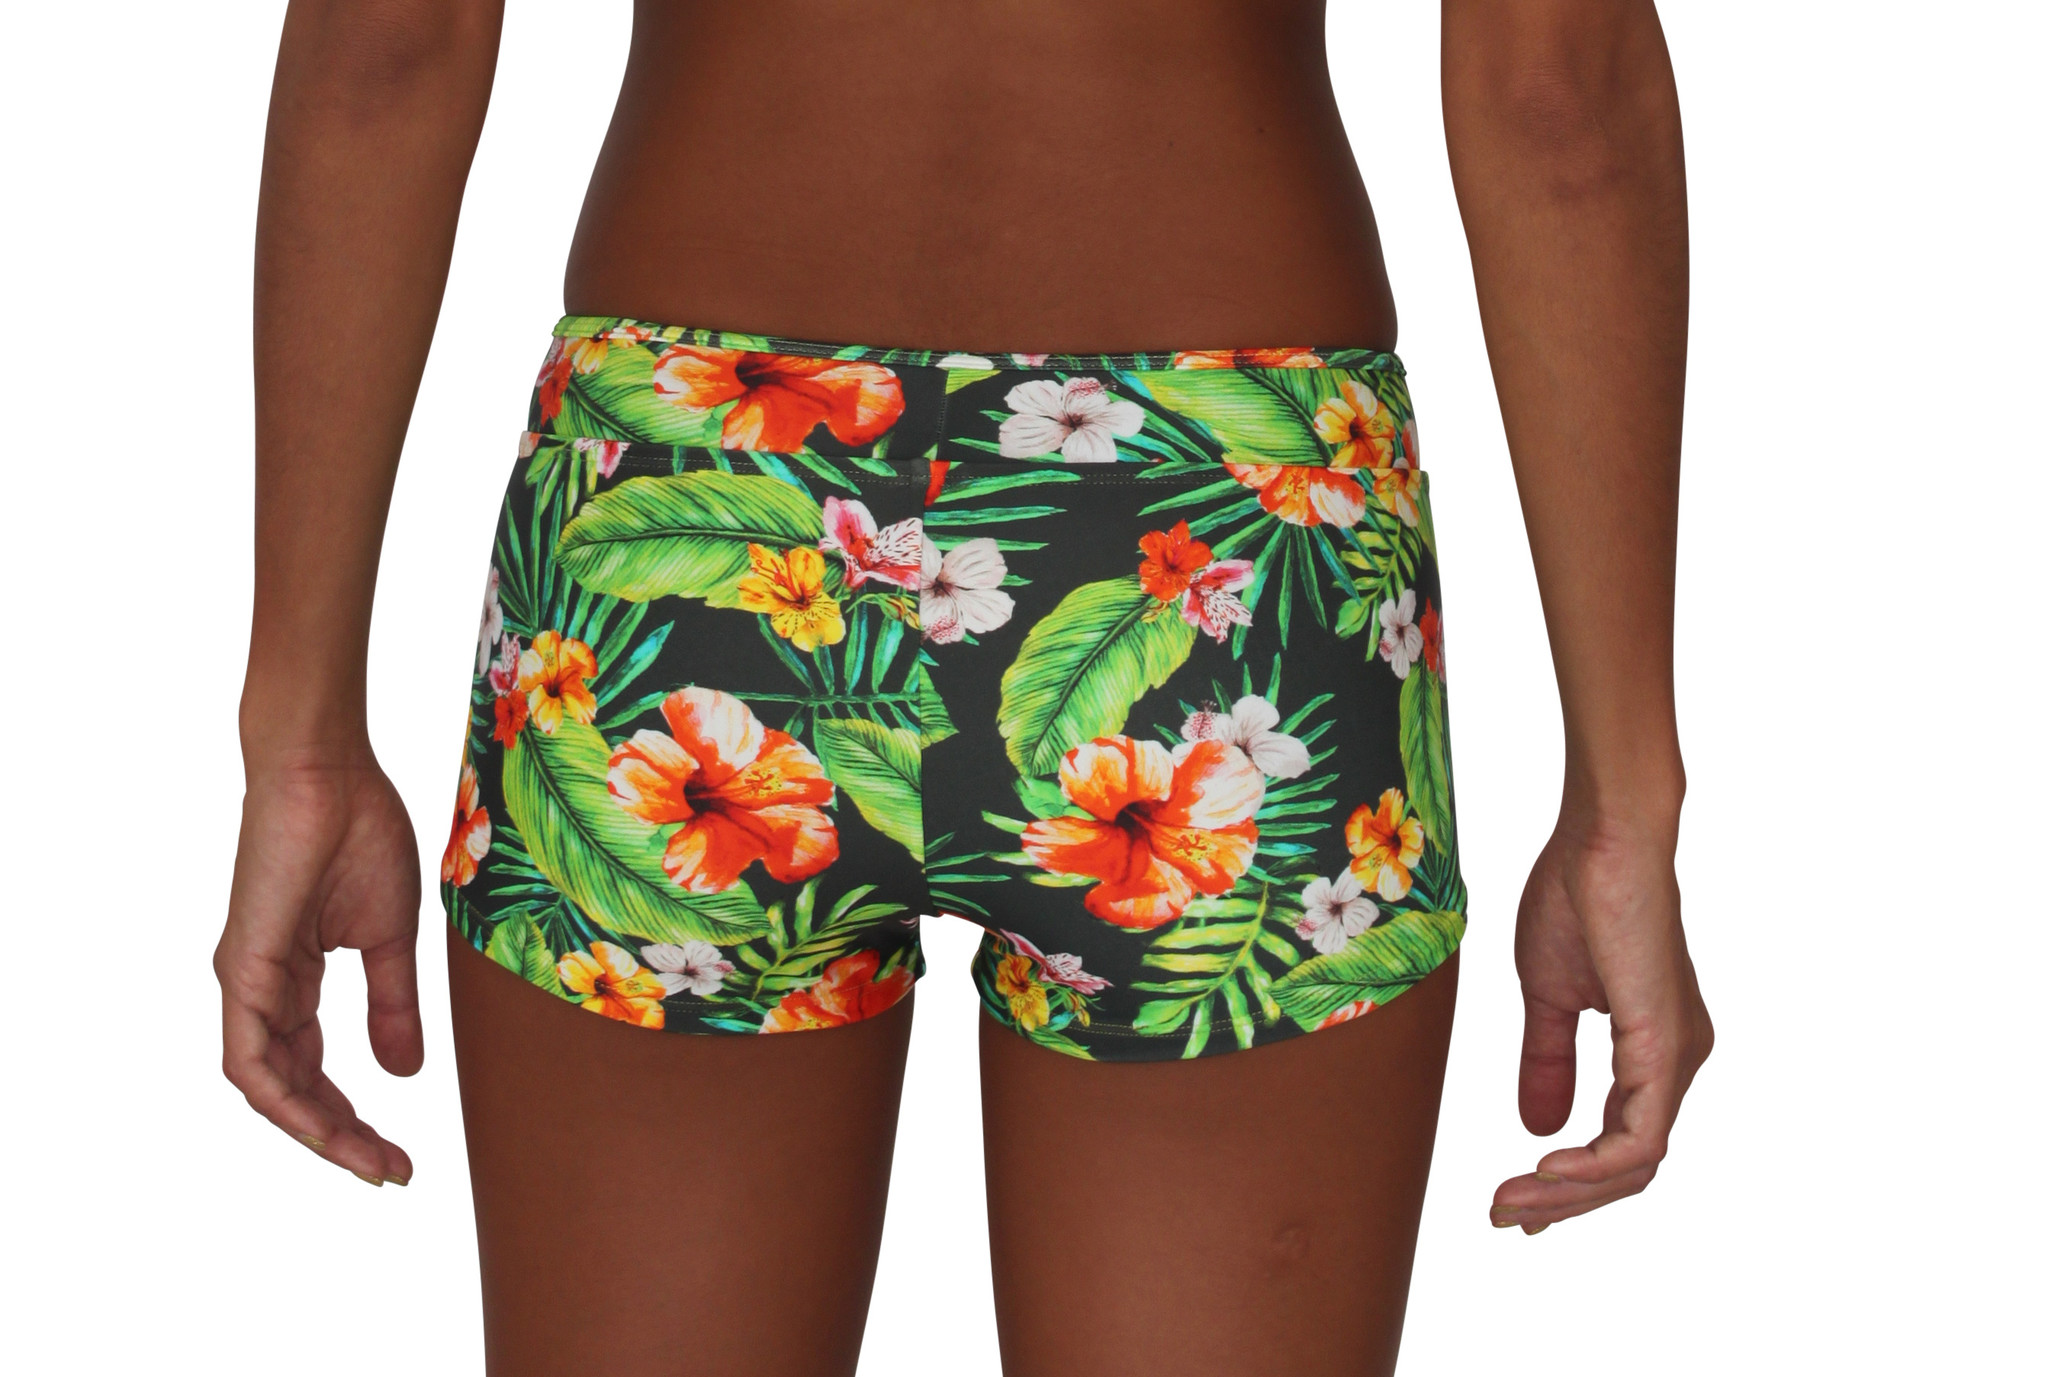 Pualani Hot Pant Jungle Love